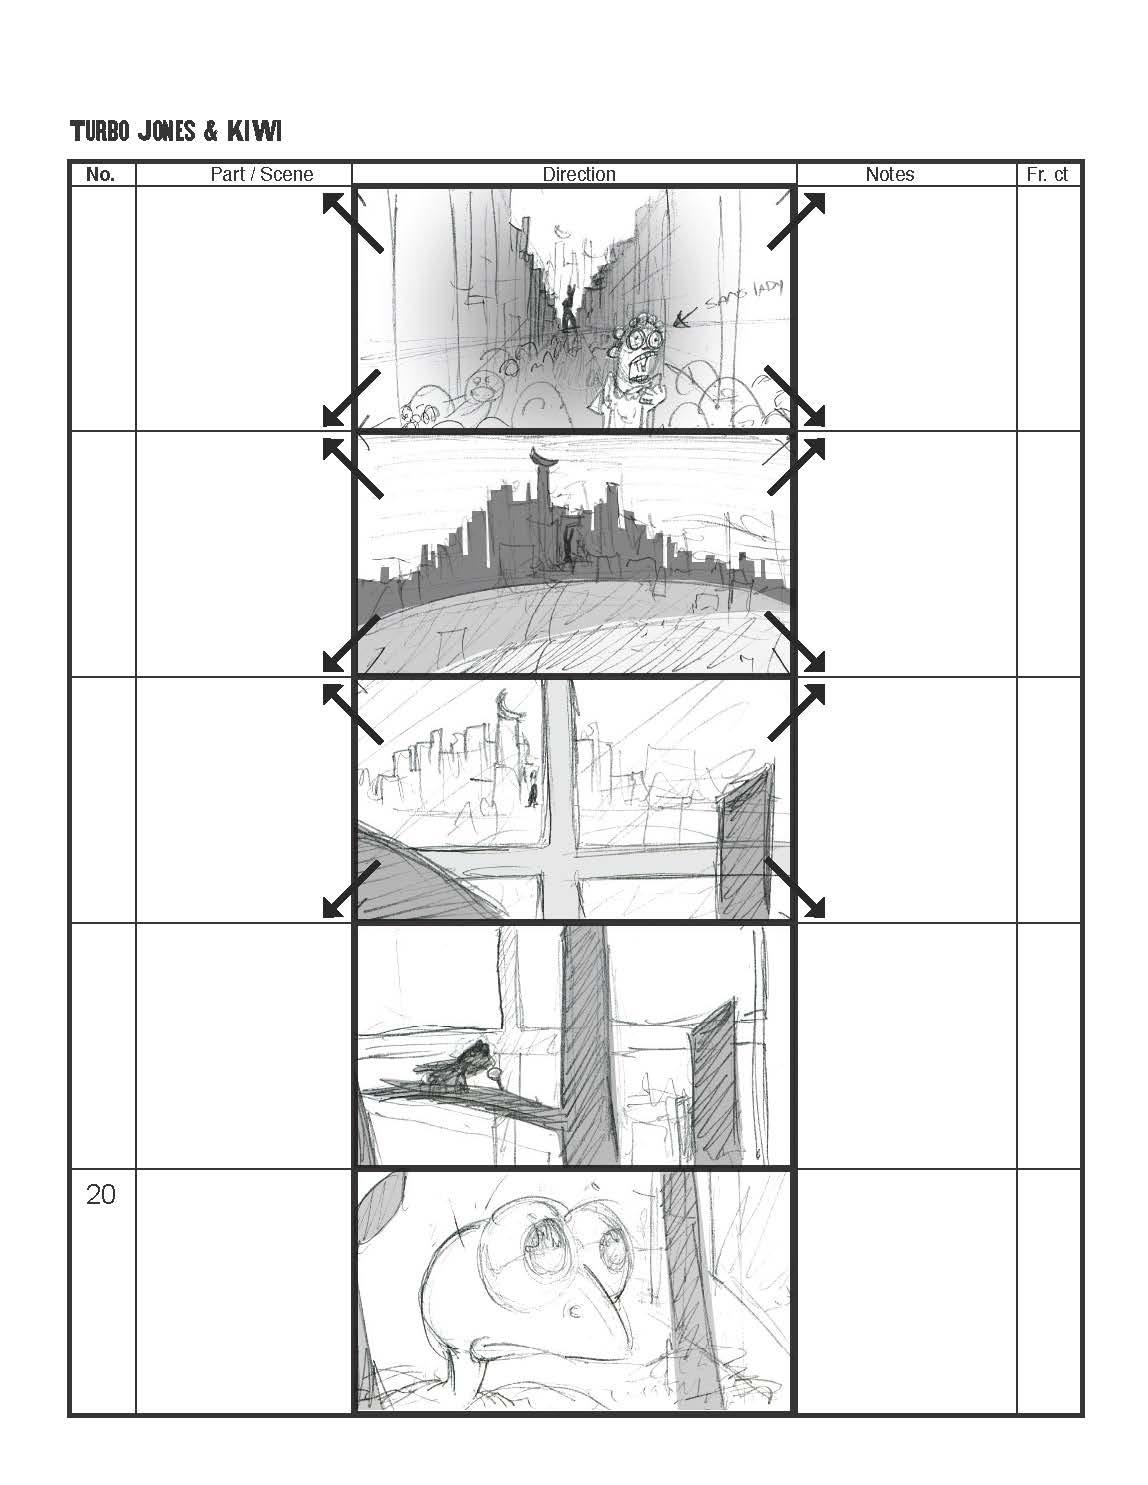 TJK_Storyboards_v01_HIGH_Page_09.jpg